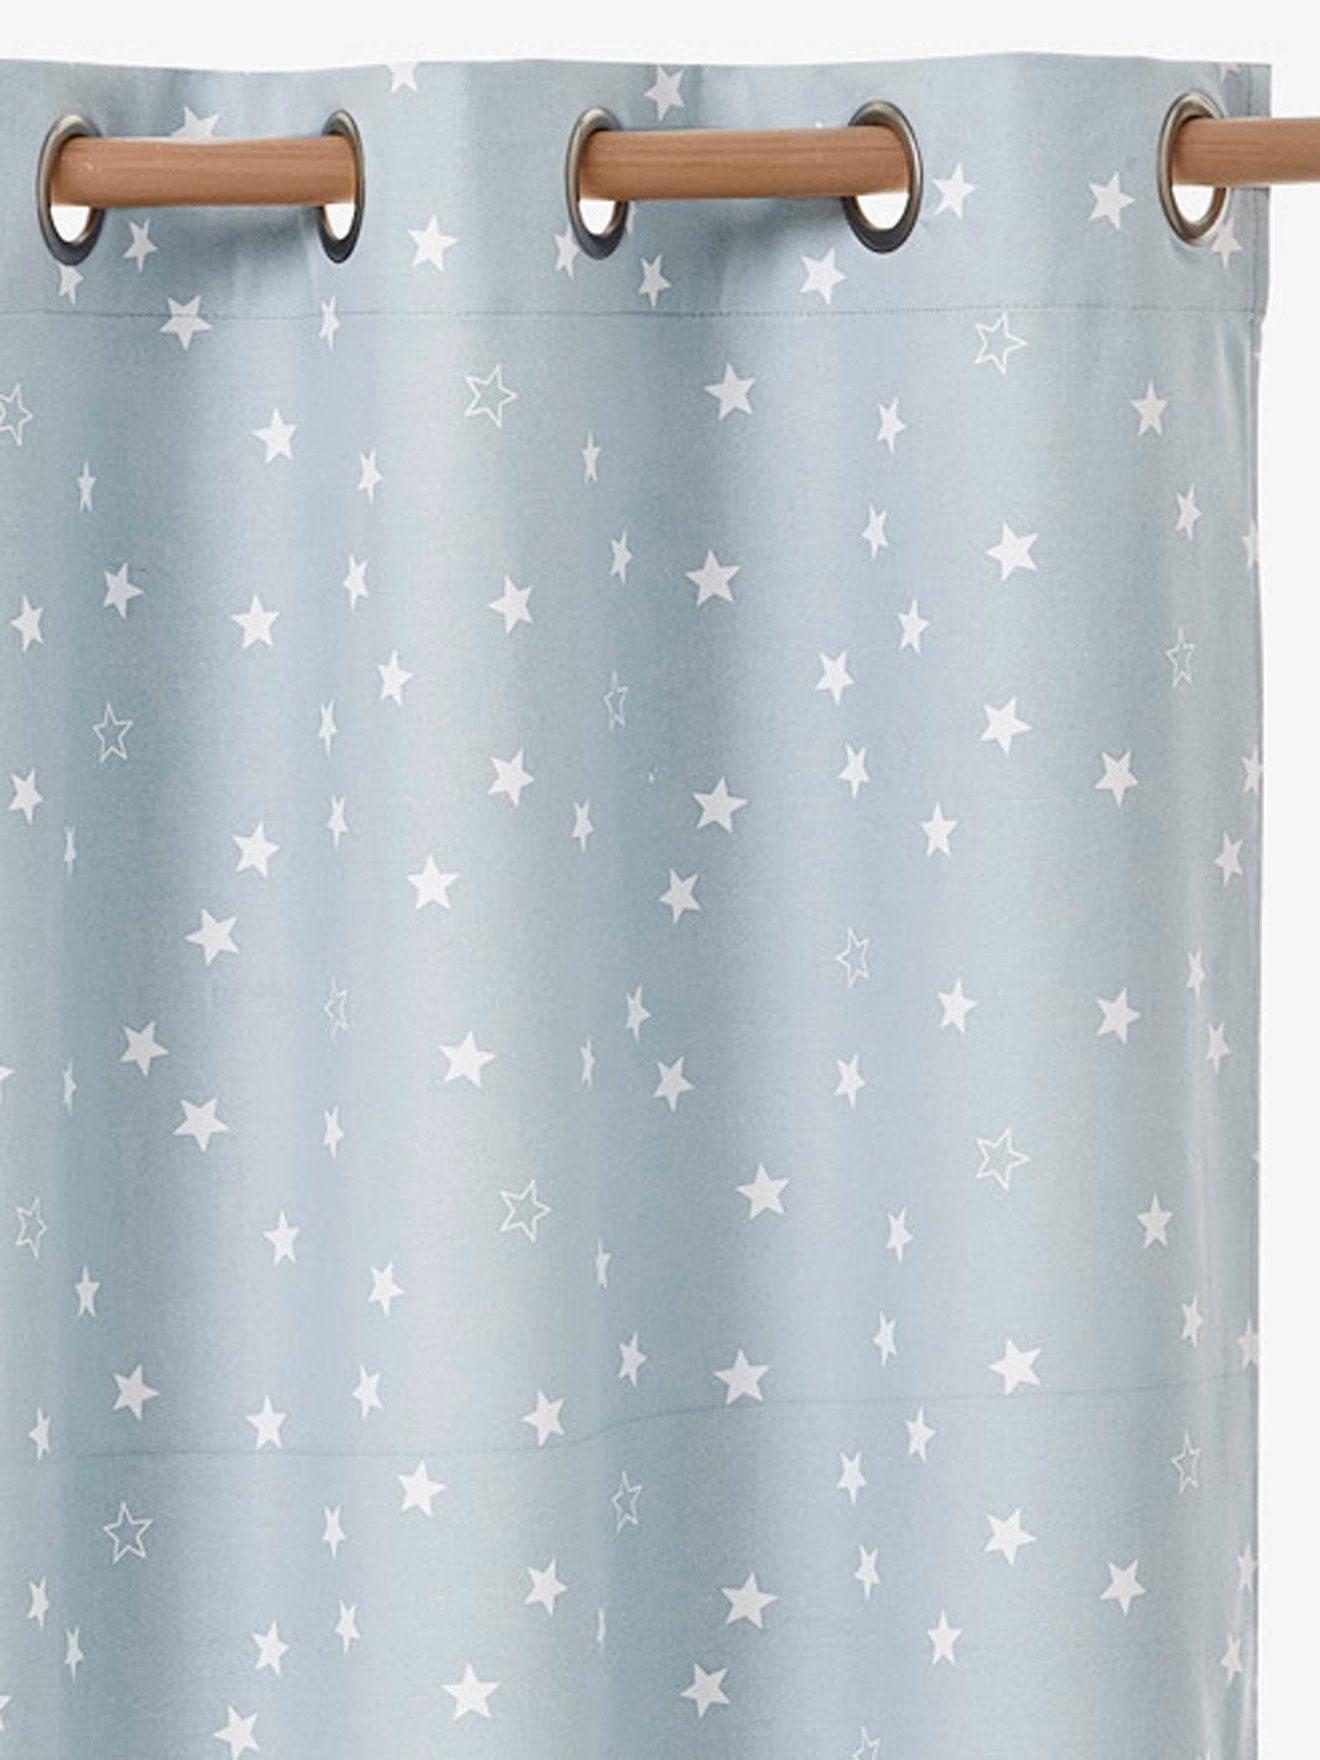 Hollow Star Starry Curtain Blue Bedding Amp Decor